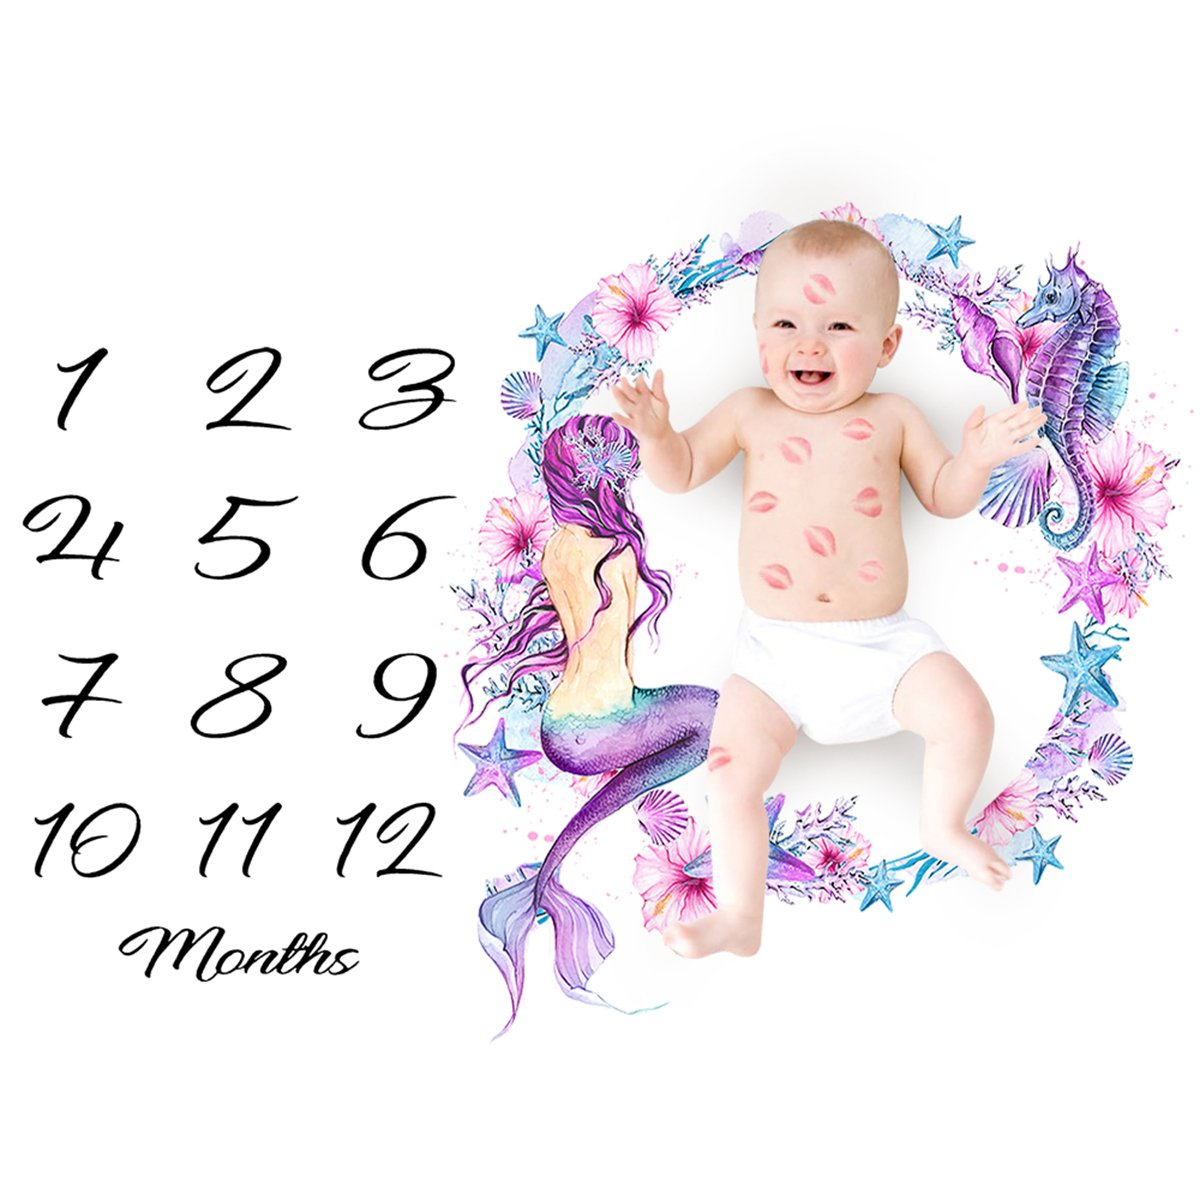 Baby Monthly Milestone Blanket,Newborn Infant Baby Boy Girl Monthly Milestone Blanket Calendar for Photopraghy Photo Props Backdrop Background Cloth (Mermaid)